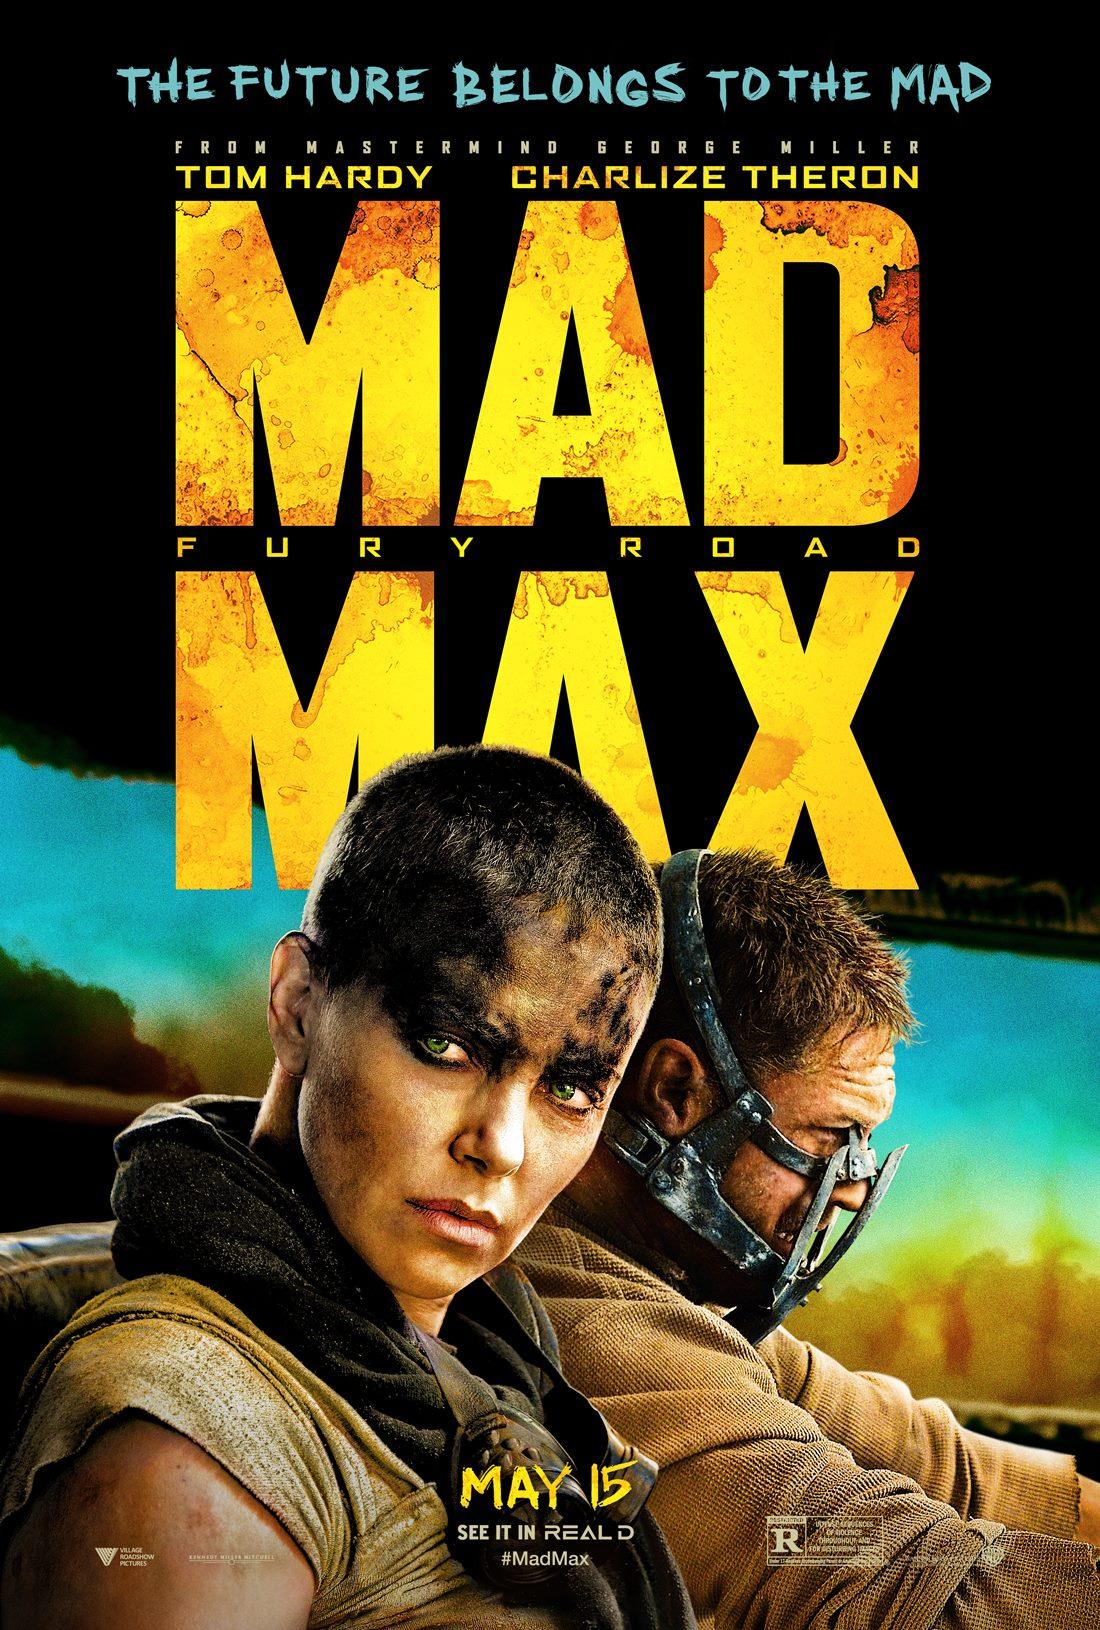 MADMAX_201512280654009bc.jpg